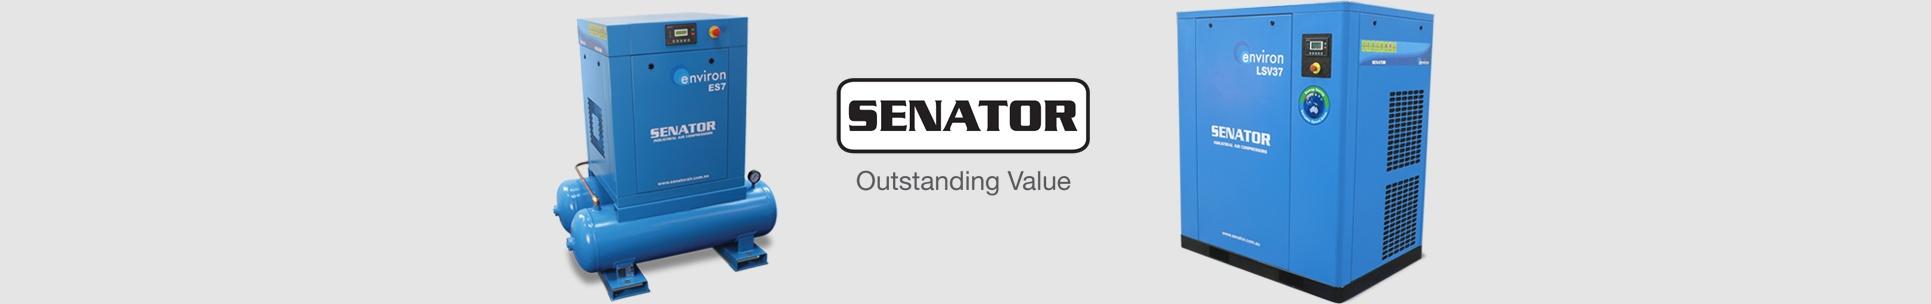 Glenco Banner Image-Senator